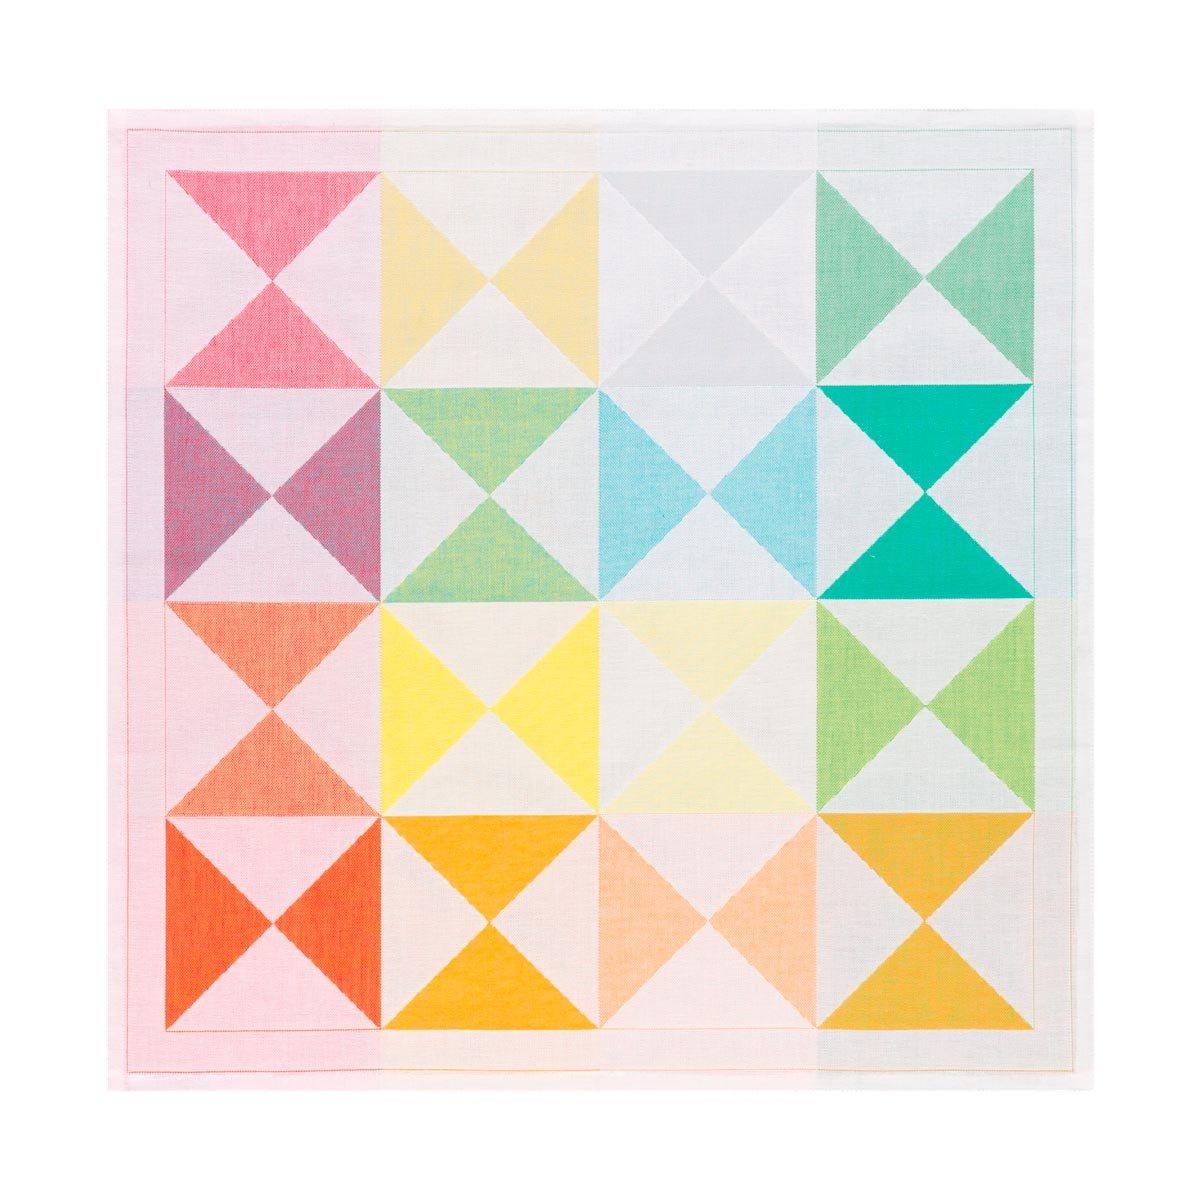 Le Jacquard Francais 20003 Toalla Origami algodón, 52 x 52 cm, Multicolor: Amazon.es: Hogar